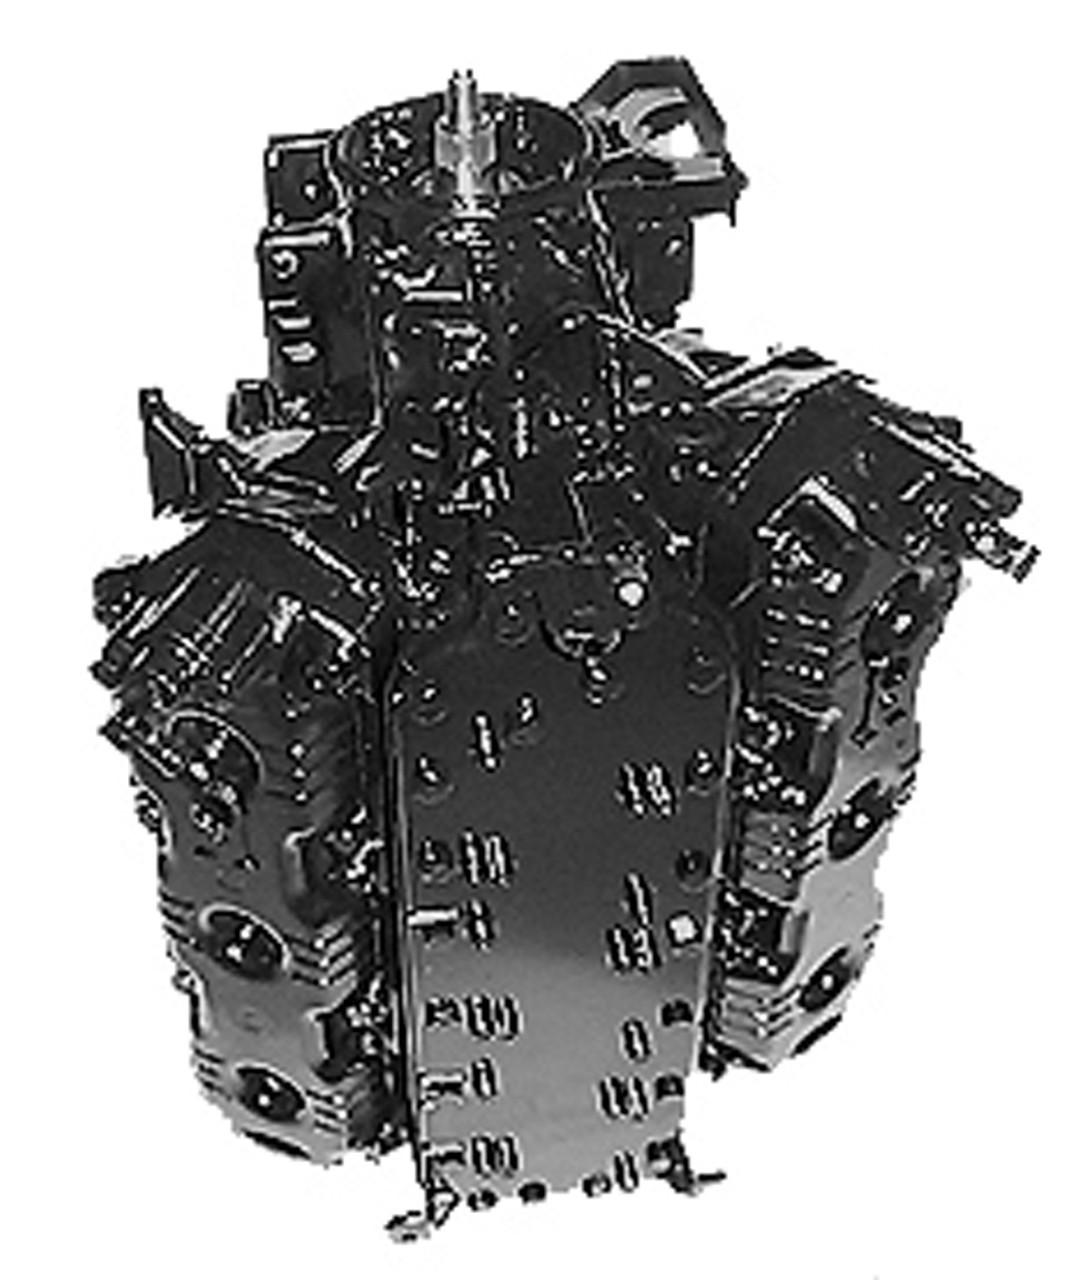 Tilt Trim Motor Mercury Mariner XR6 Marine Engine 2001 2002 2003 2004